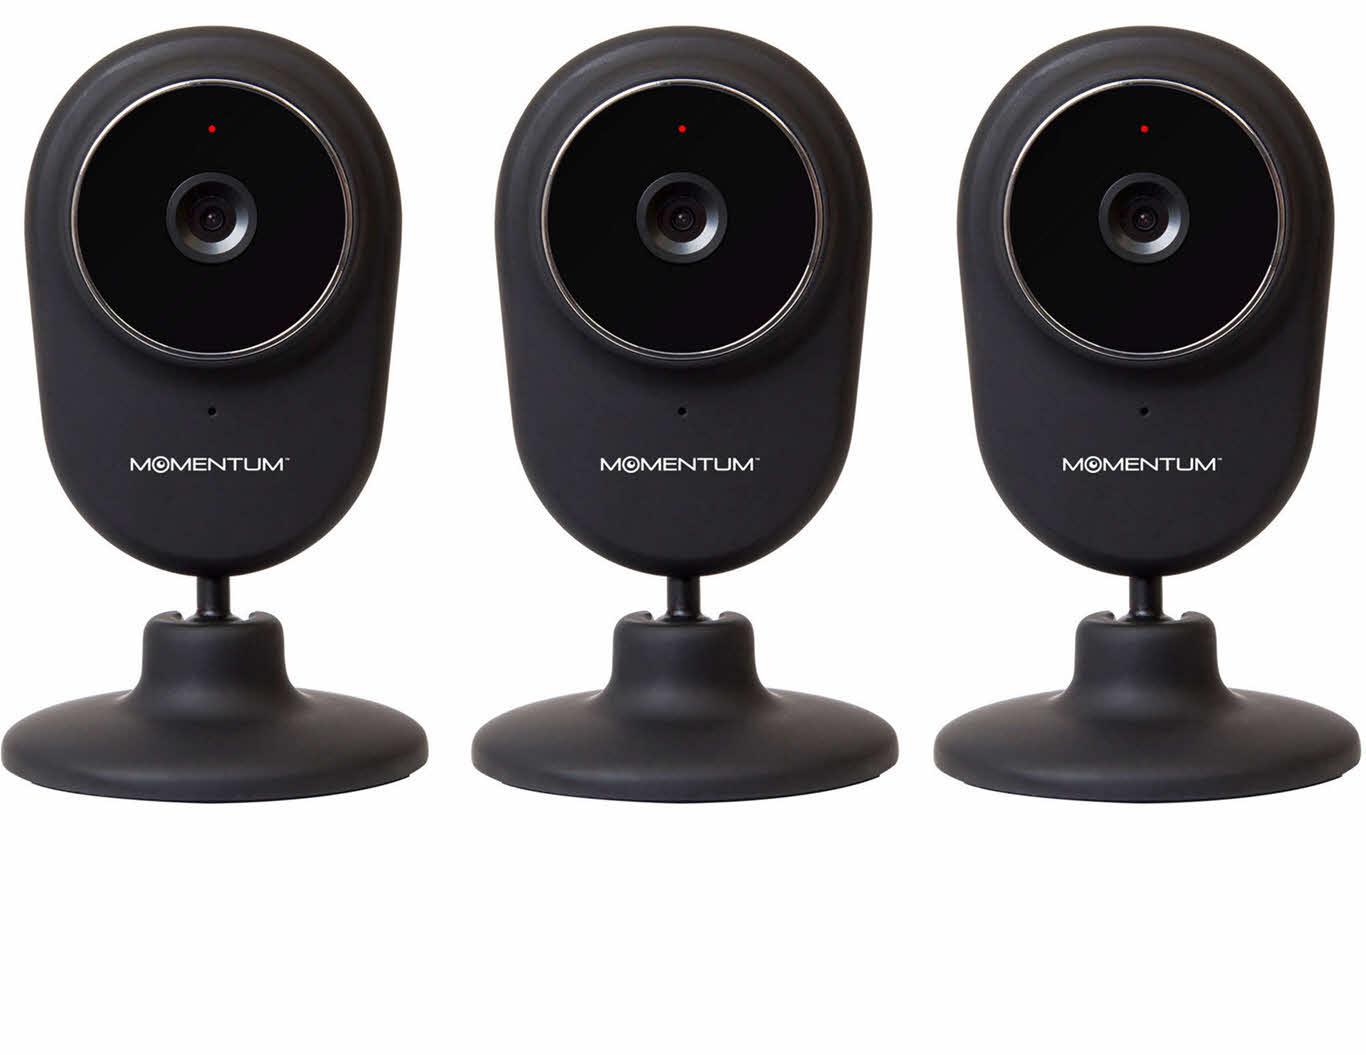 185000 cámaras WiFi vulnerables podrían reclutarse en botnets